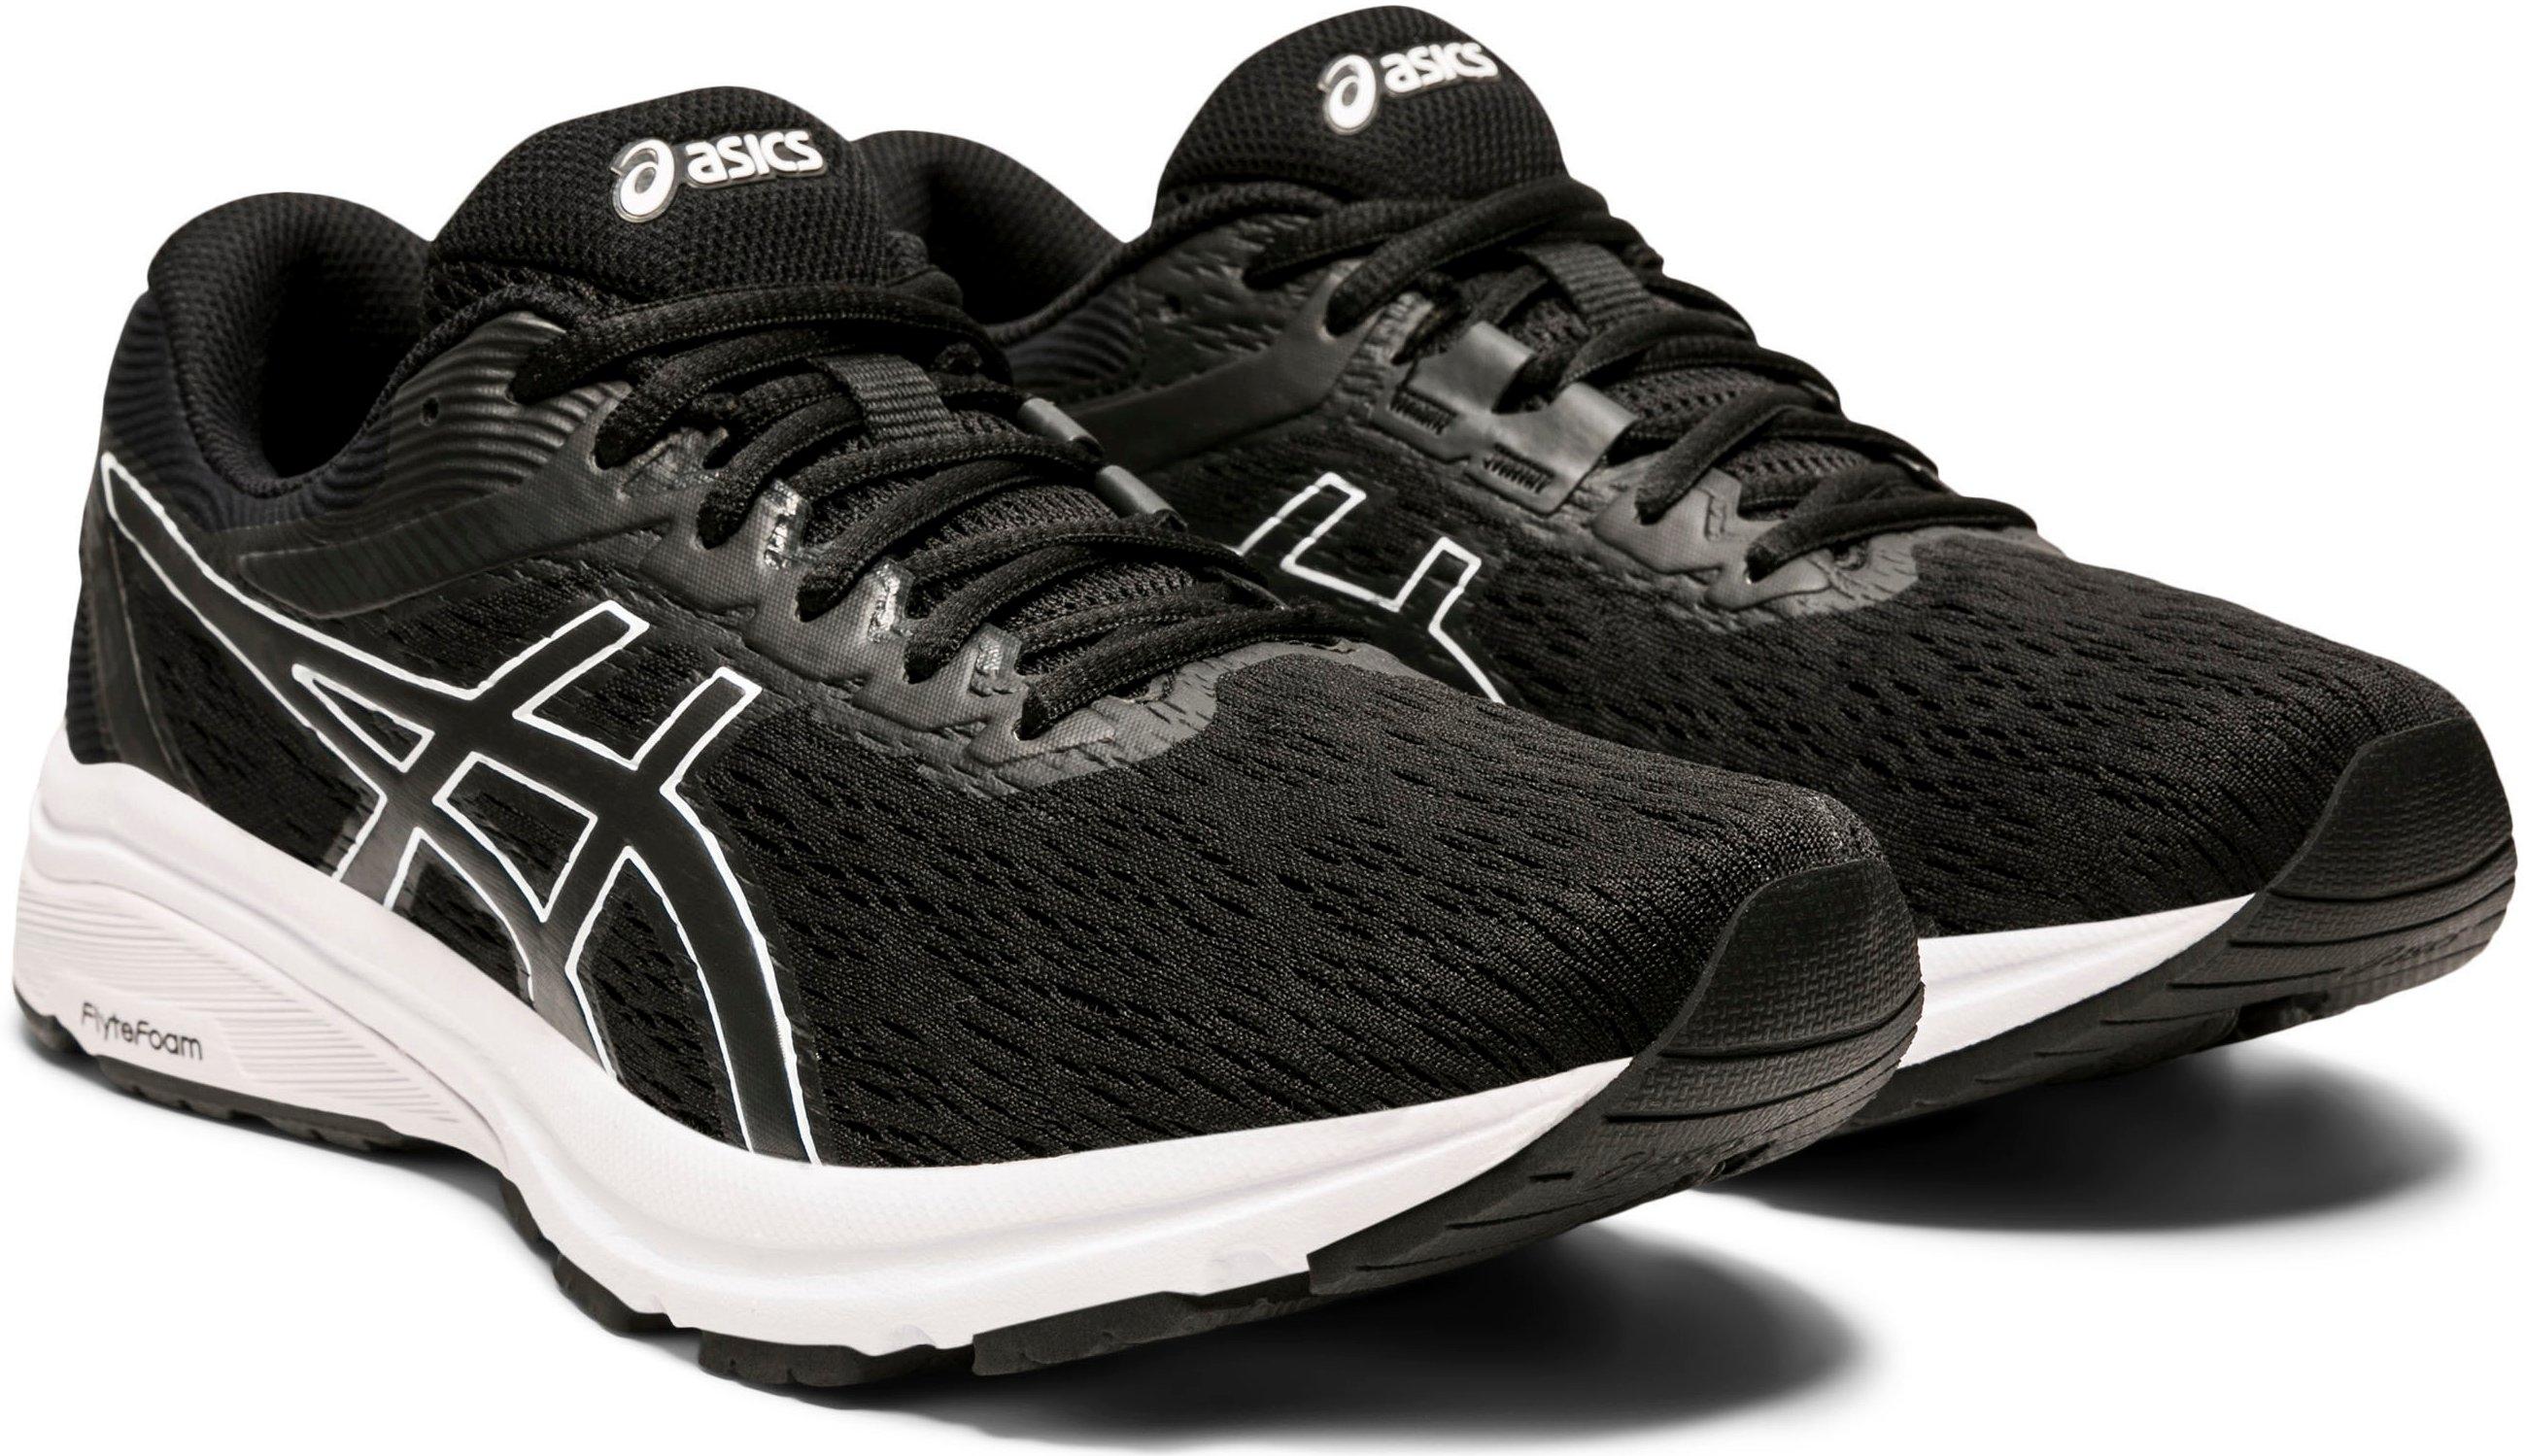 Asics runningschoenen GT-800 bij OTTO online kopen